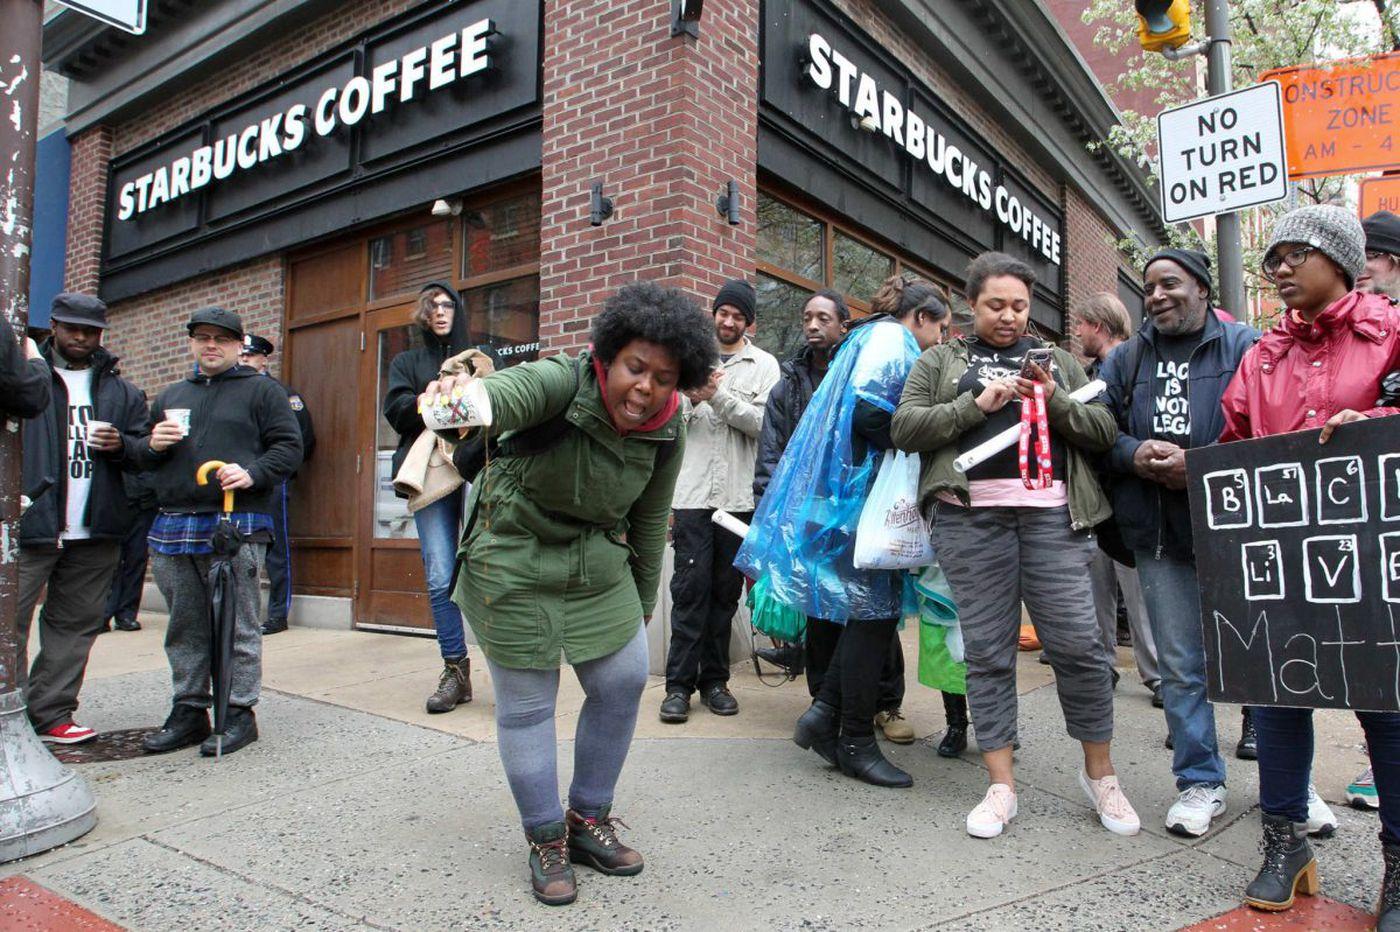 Starbucks CEO in Philadelphia as protests resume at Center City Starbucks where two black men were arrested